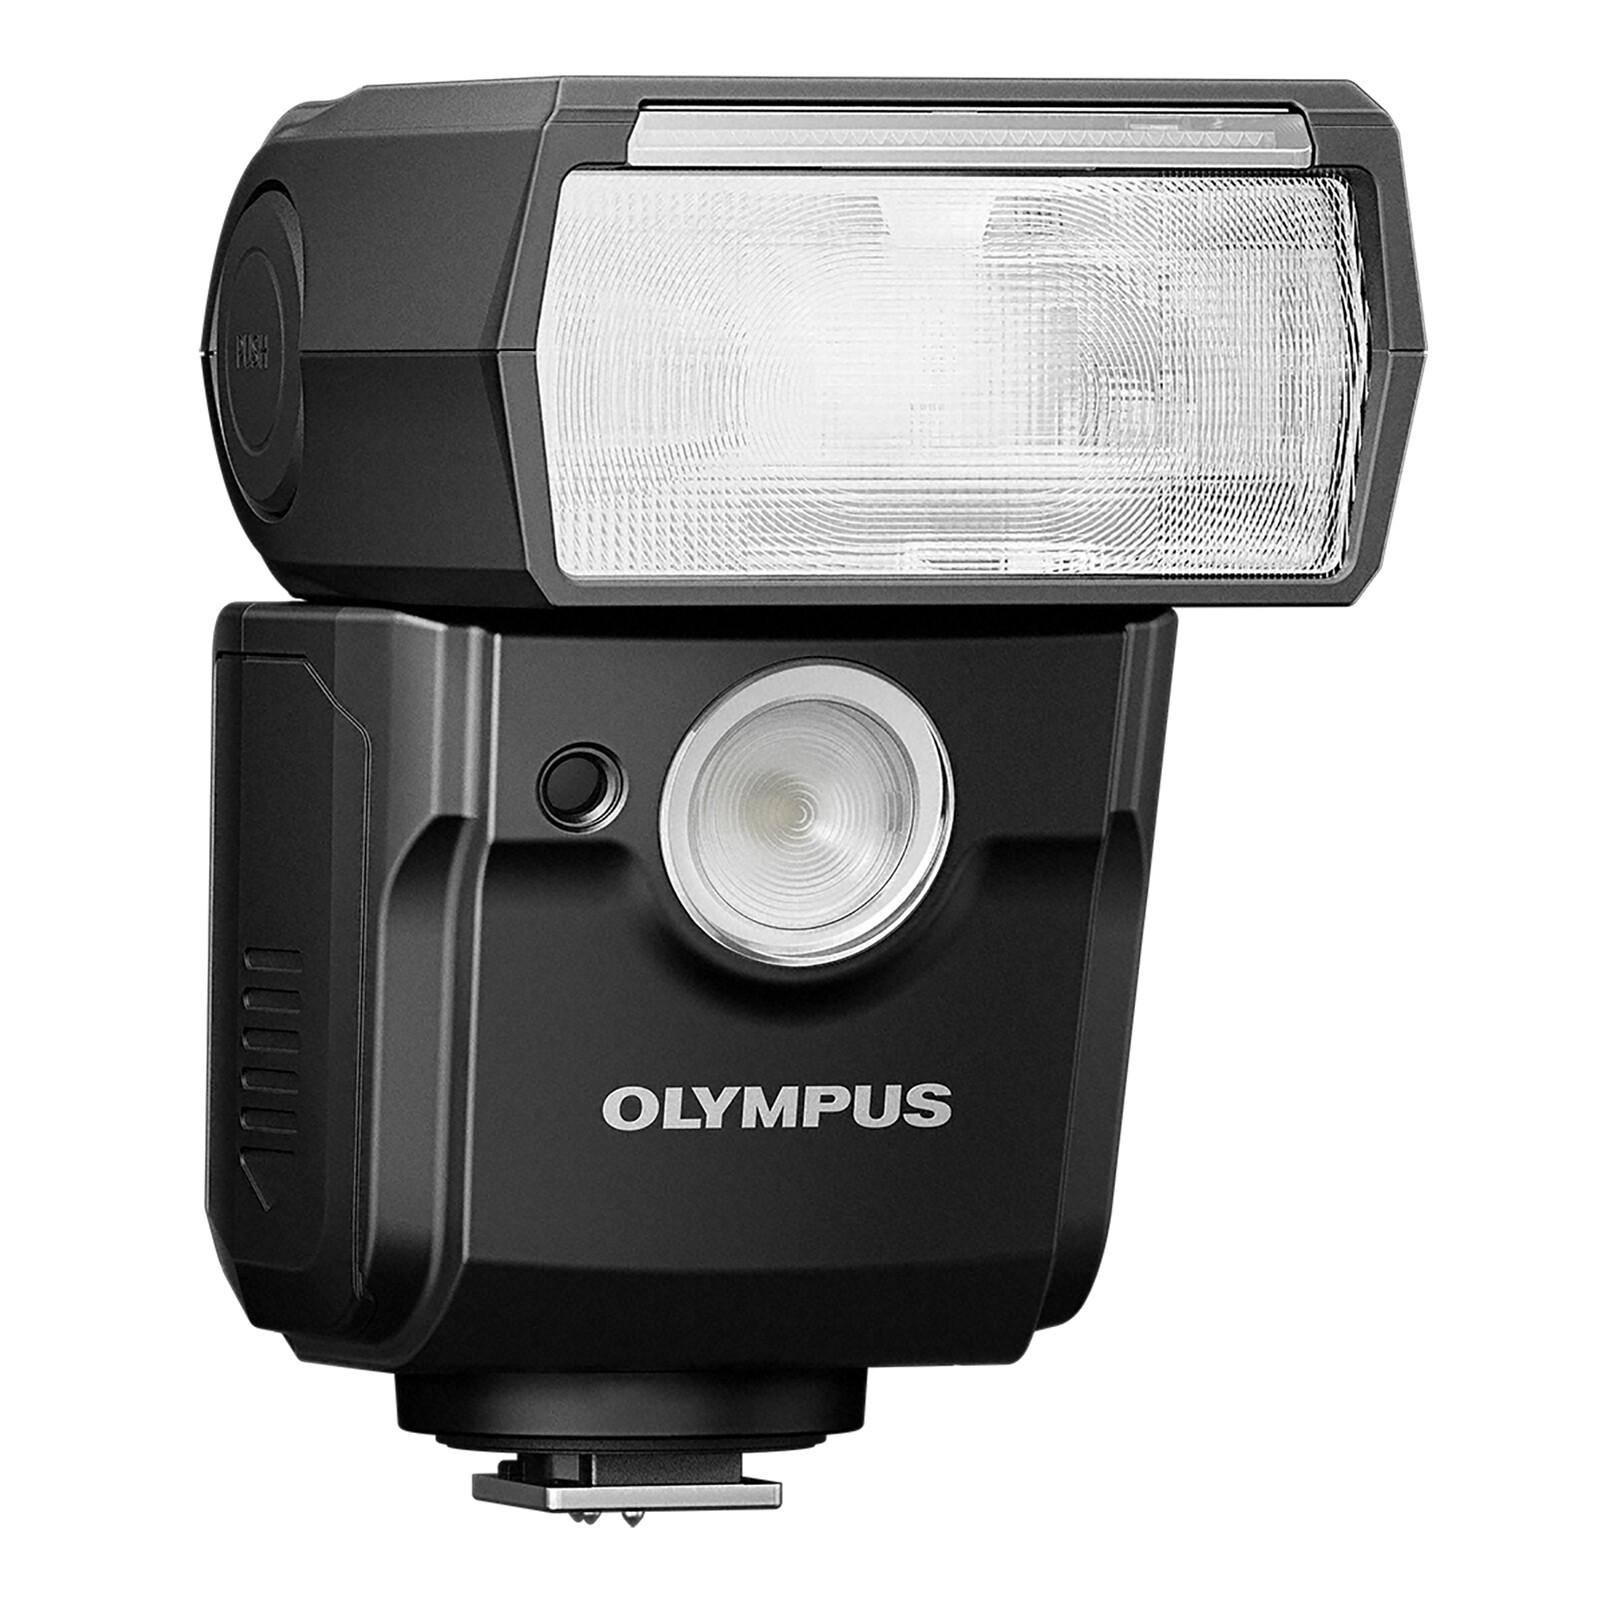 Olympus FL-700 Blitz